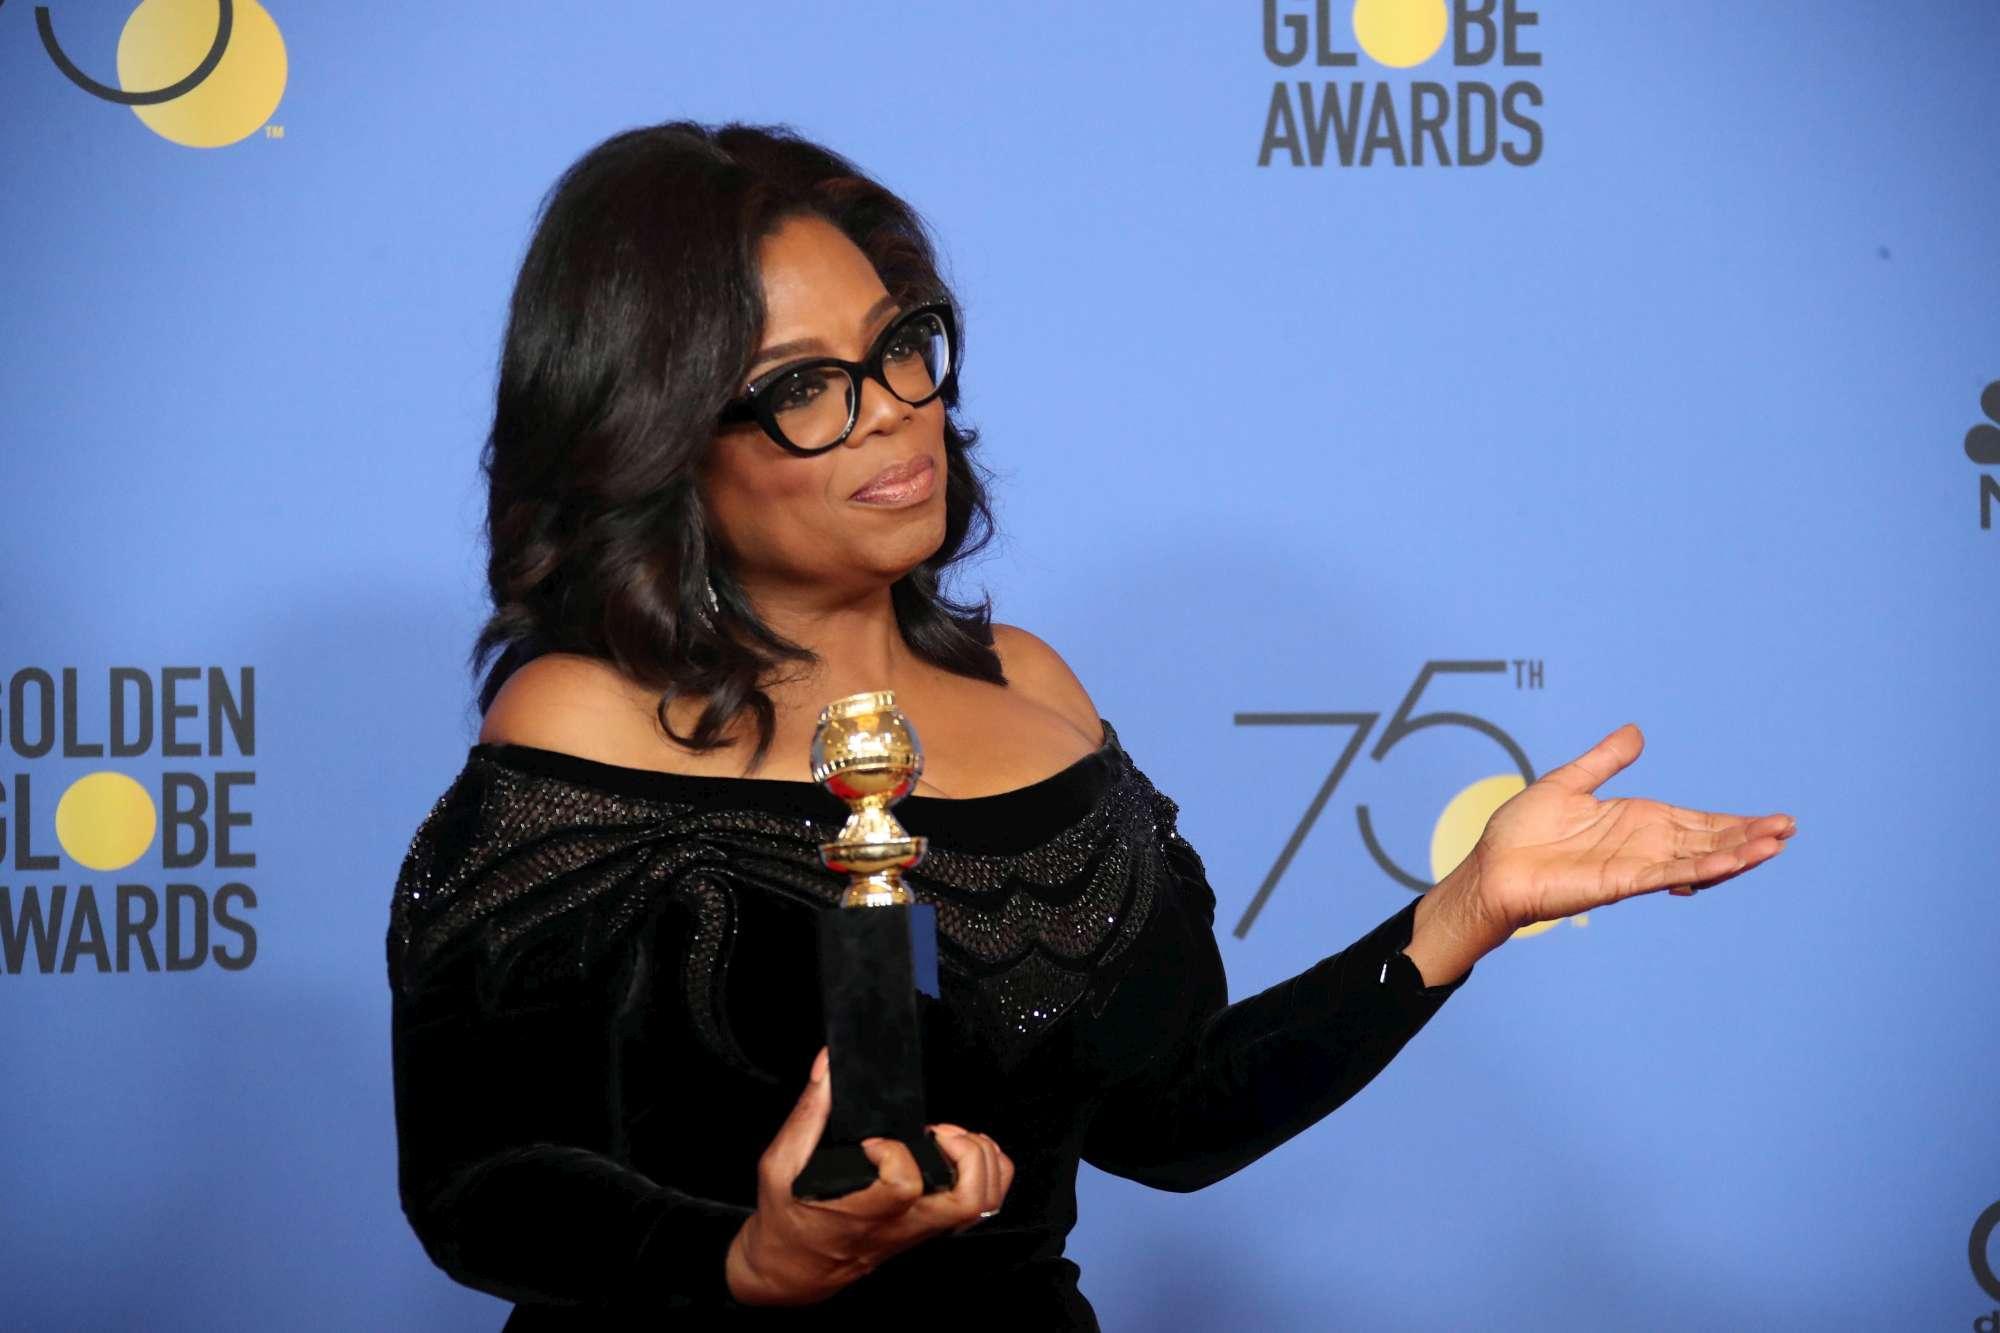 Oprah Winfrey: paura e libertà